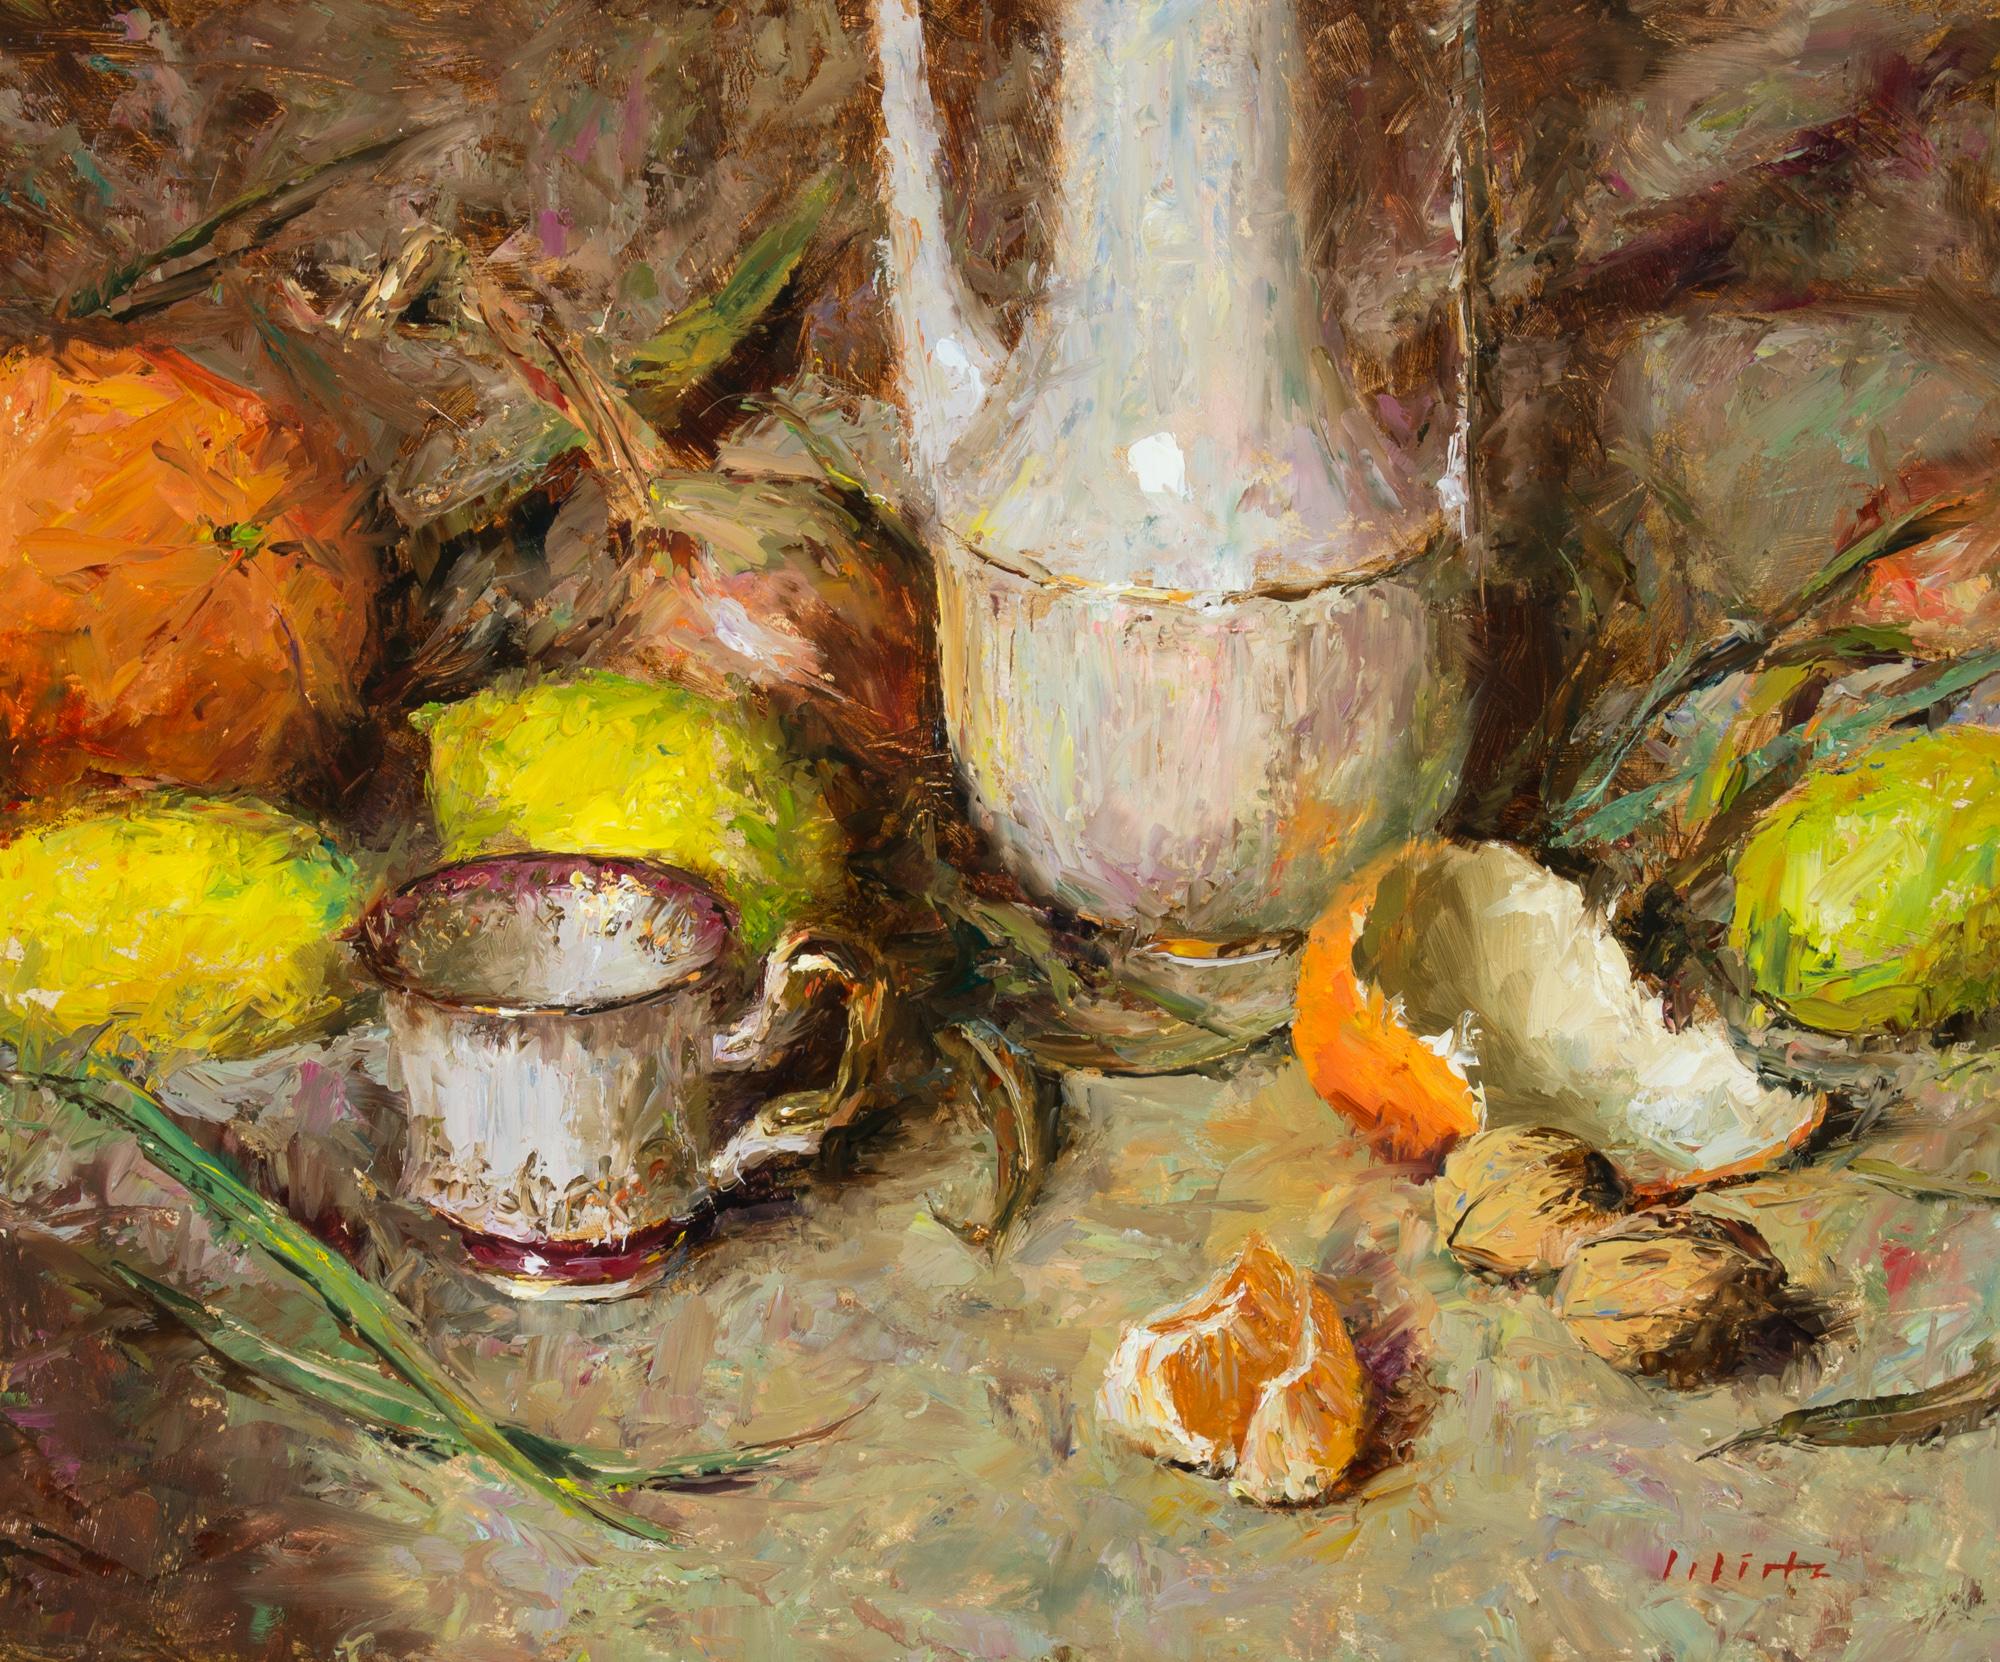 Björn Wirtz, Composition with Tangerine, Oil on Panel, 25 cm x 30 cm x 0,3 cm,  http://www.bjoernwirtz.com